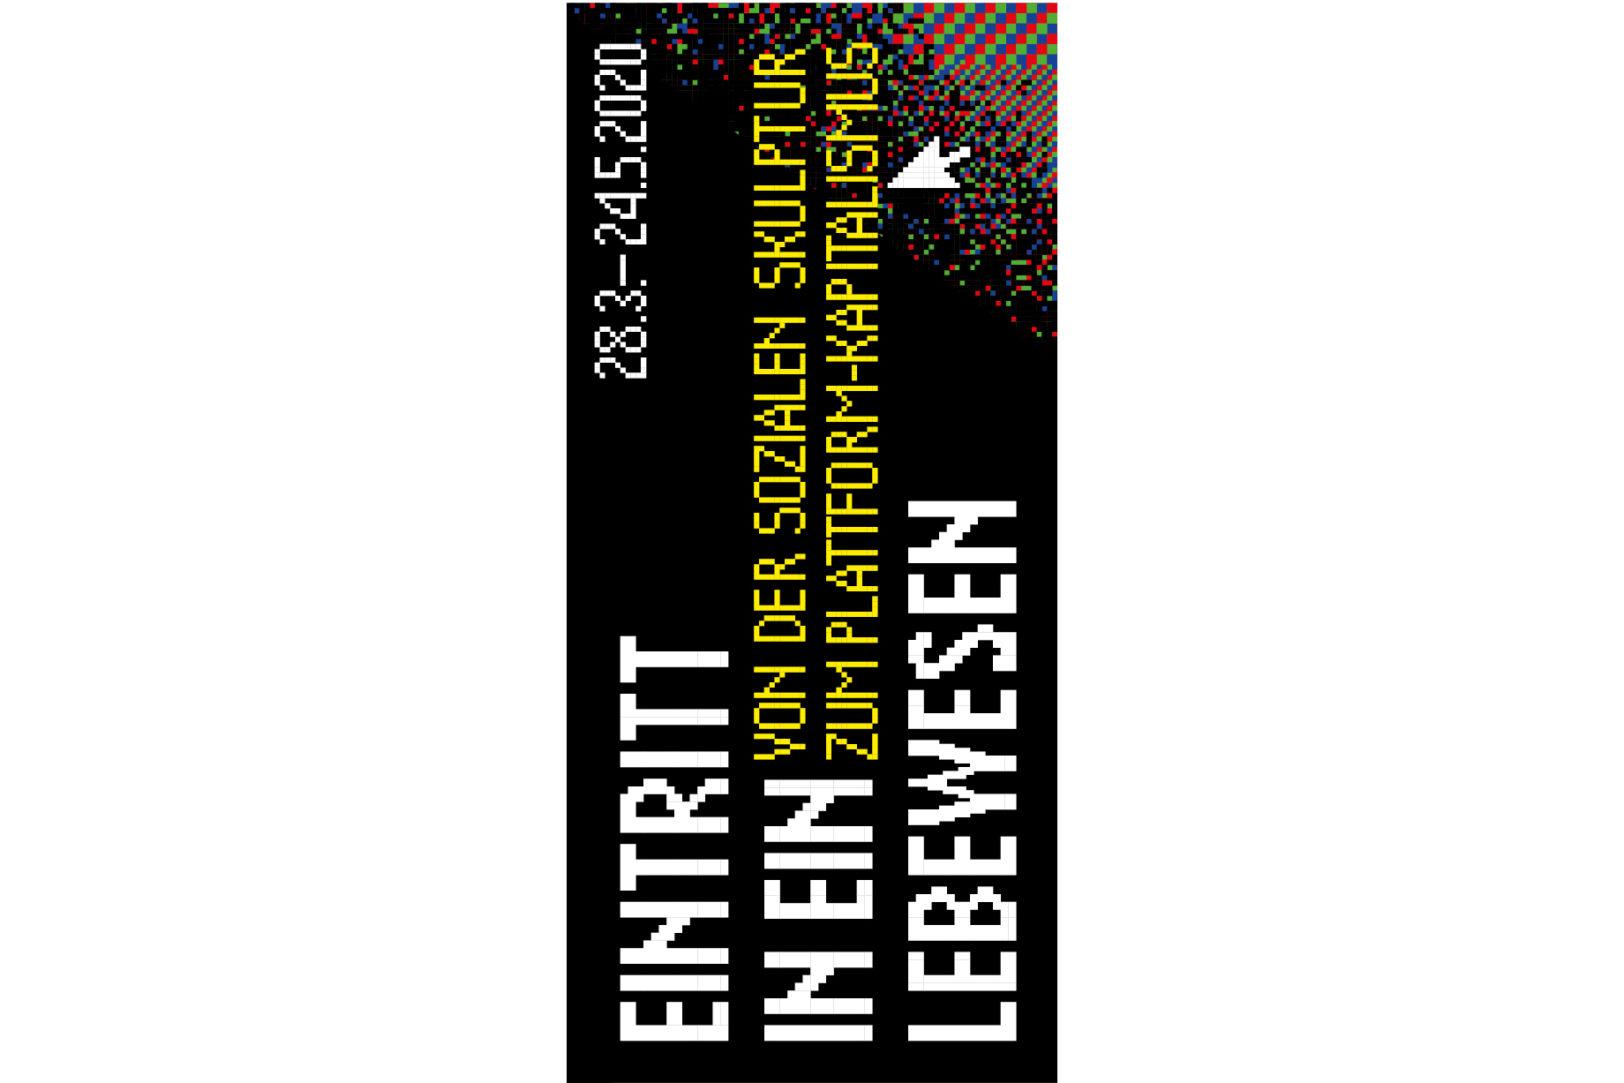 http://e-o-t.de/wordpress/wp-content/uploads/2020/03/Lebewesen-Identity-eot.jpg